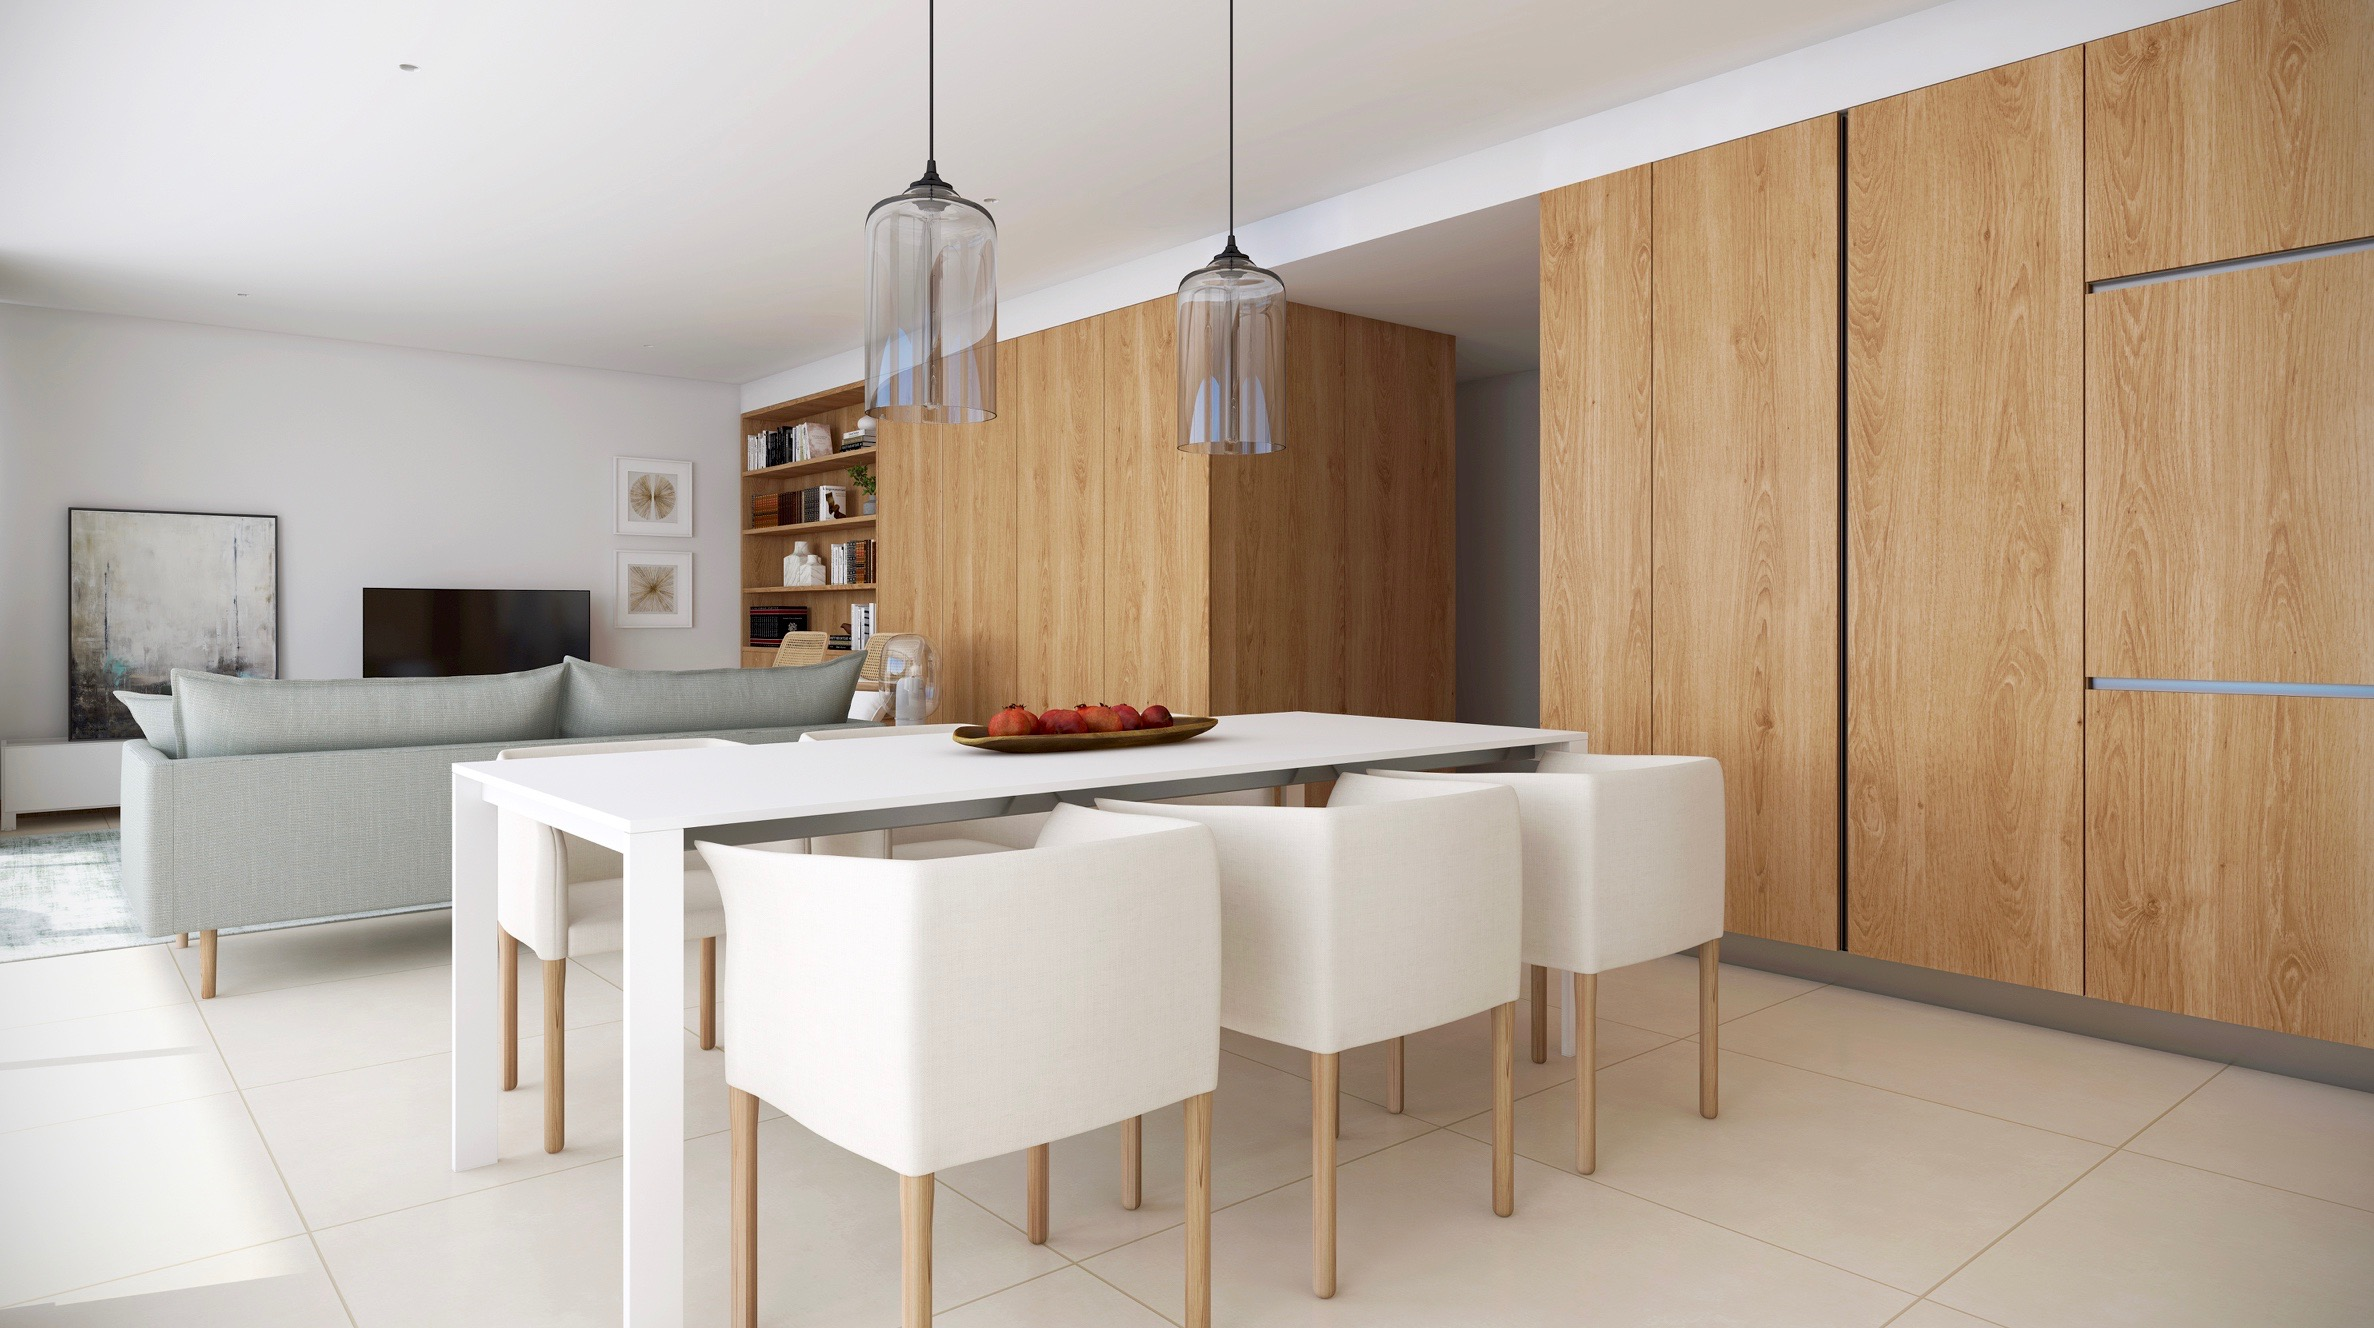 Luxury 3 bedroom apartment with sea views in Lagos  - Algarve